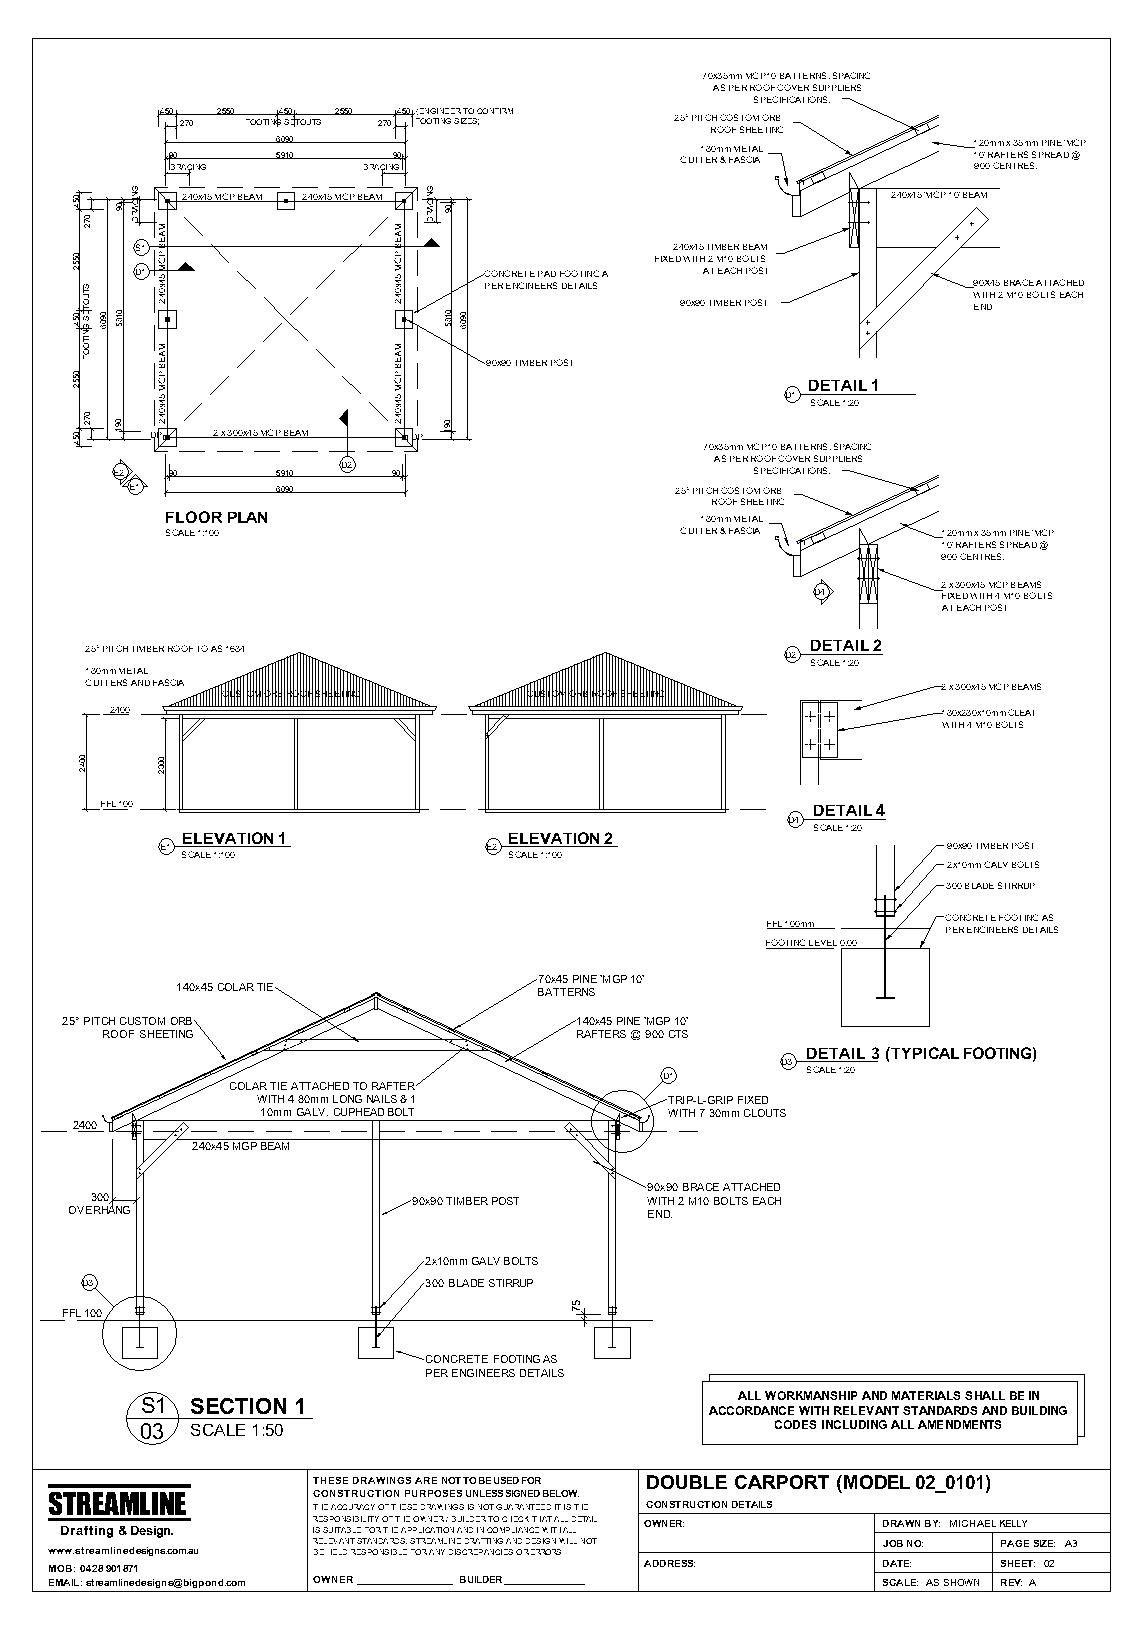 wood frame construction manual pdf